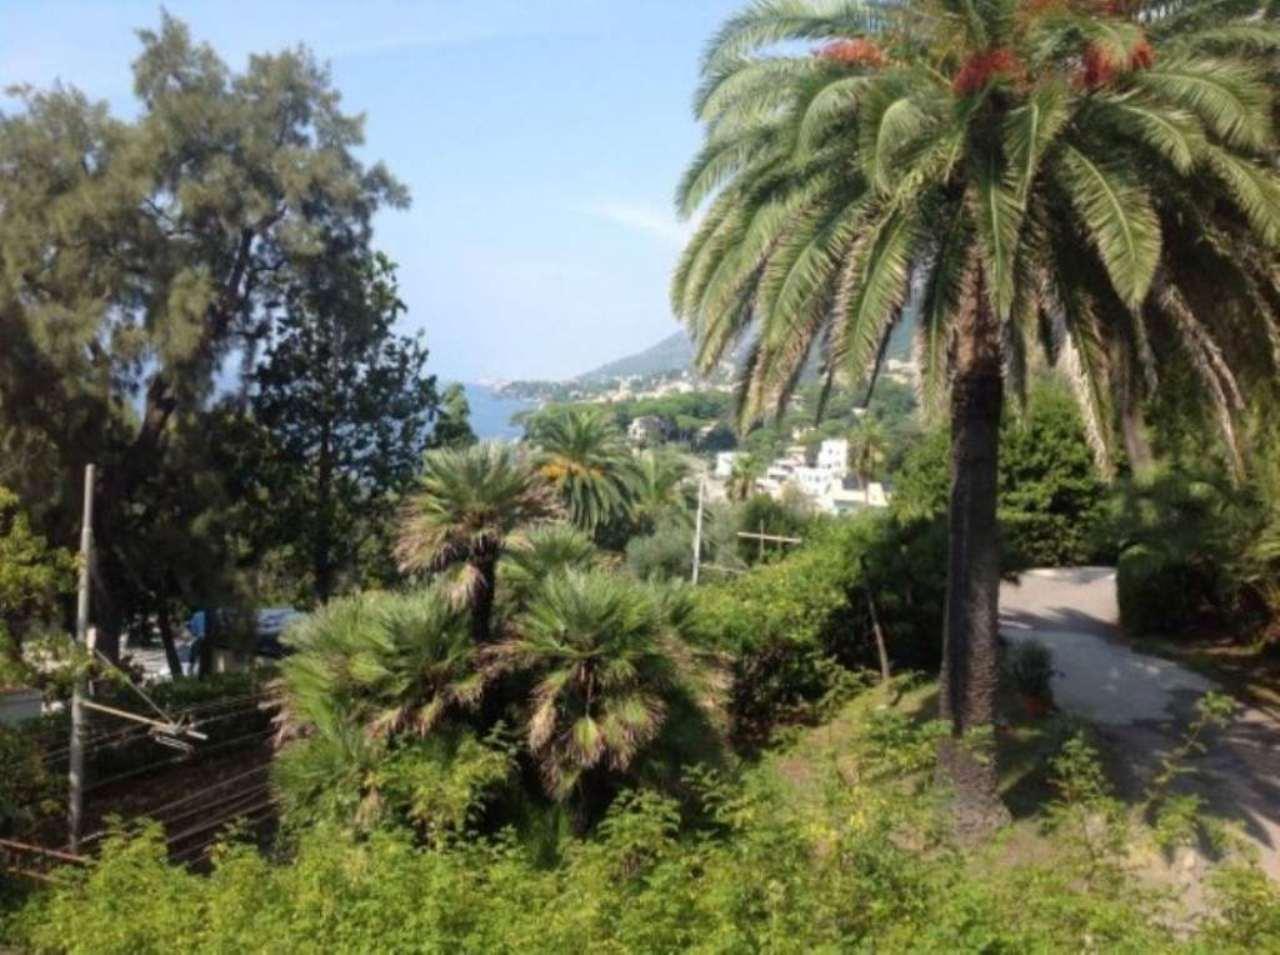 Soluzione Indipendente in vendita a Pieve Ligure, 6 locali, Trattative riservate | Cambio Casa.it